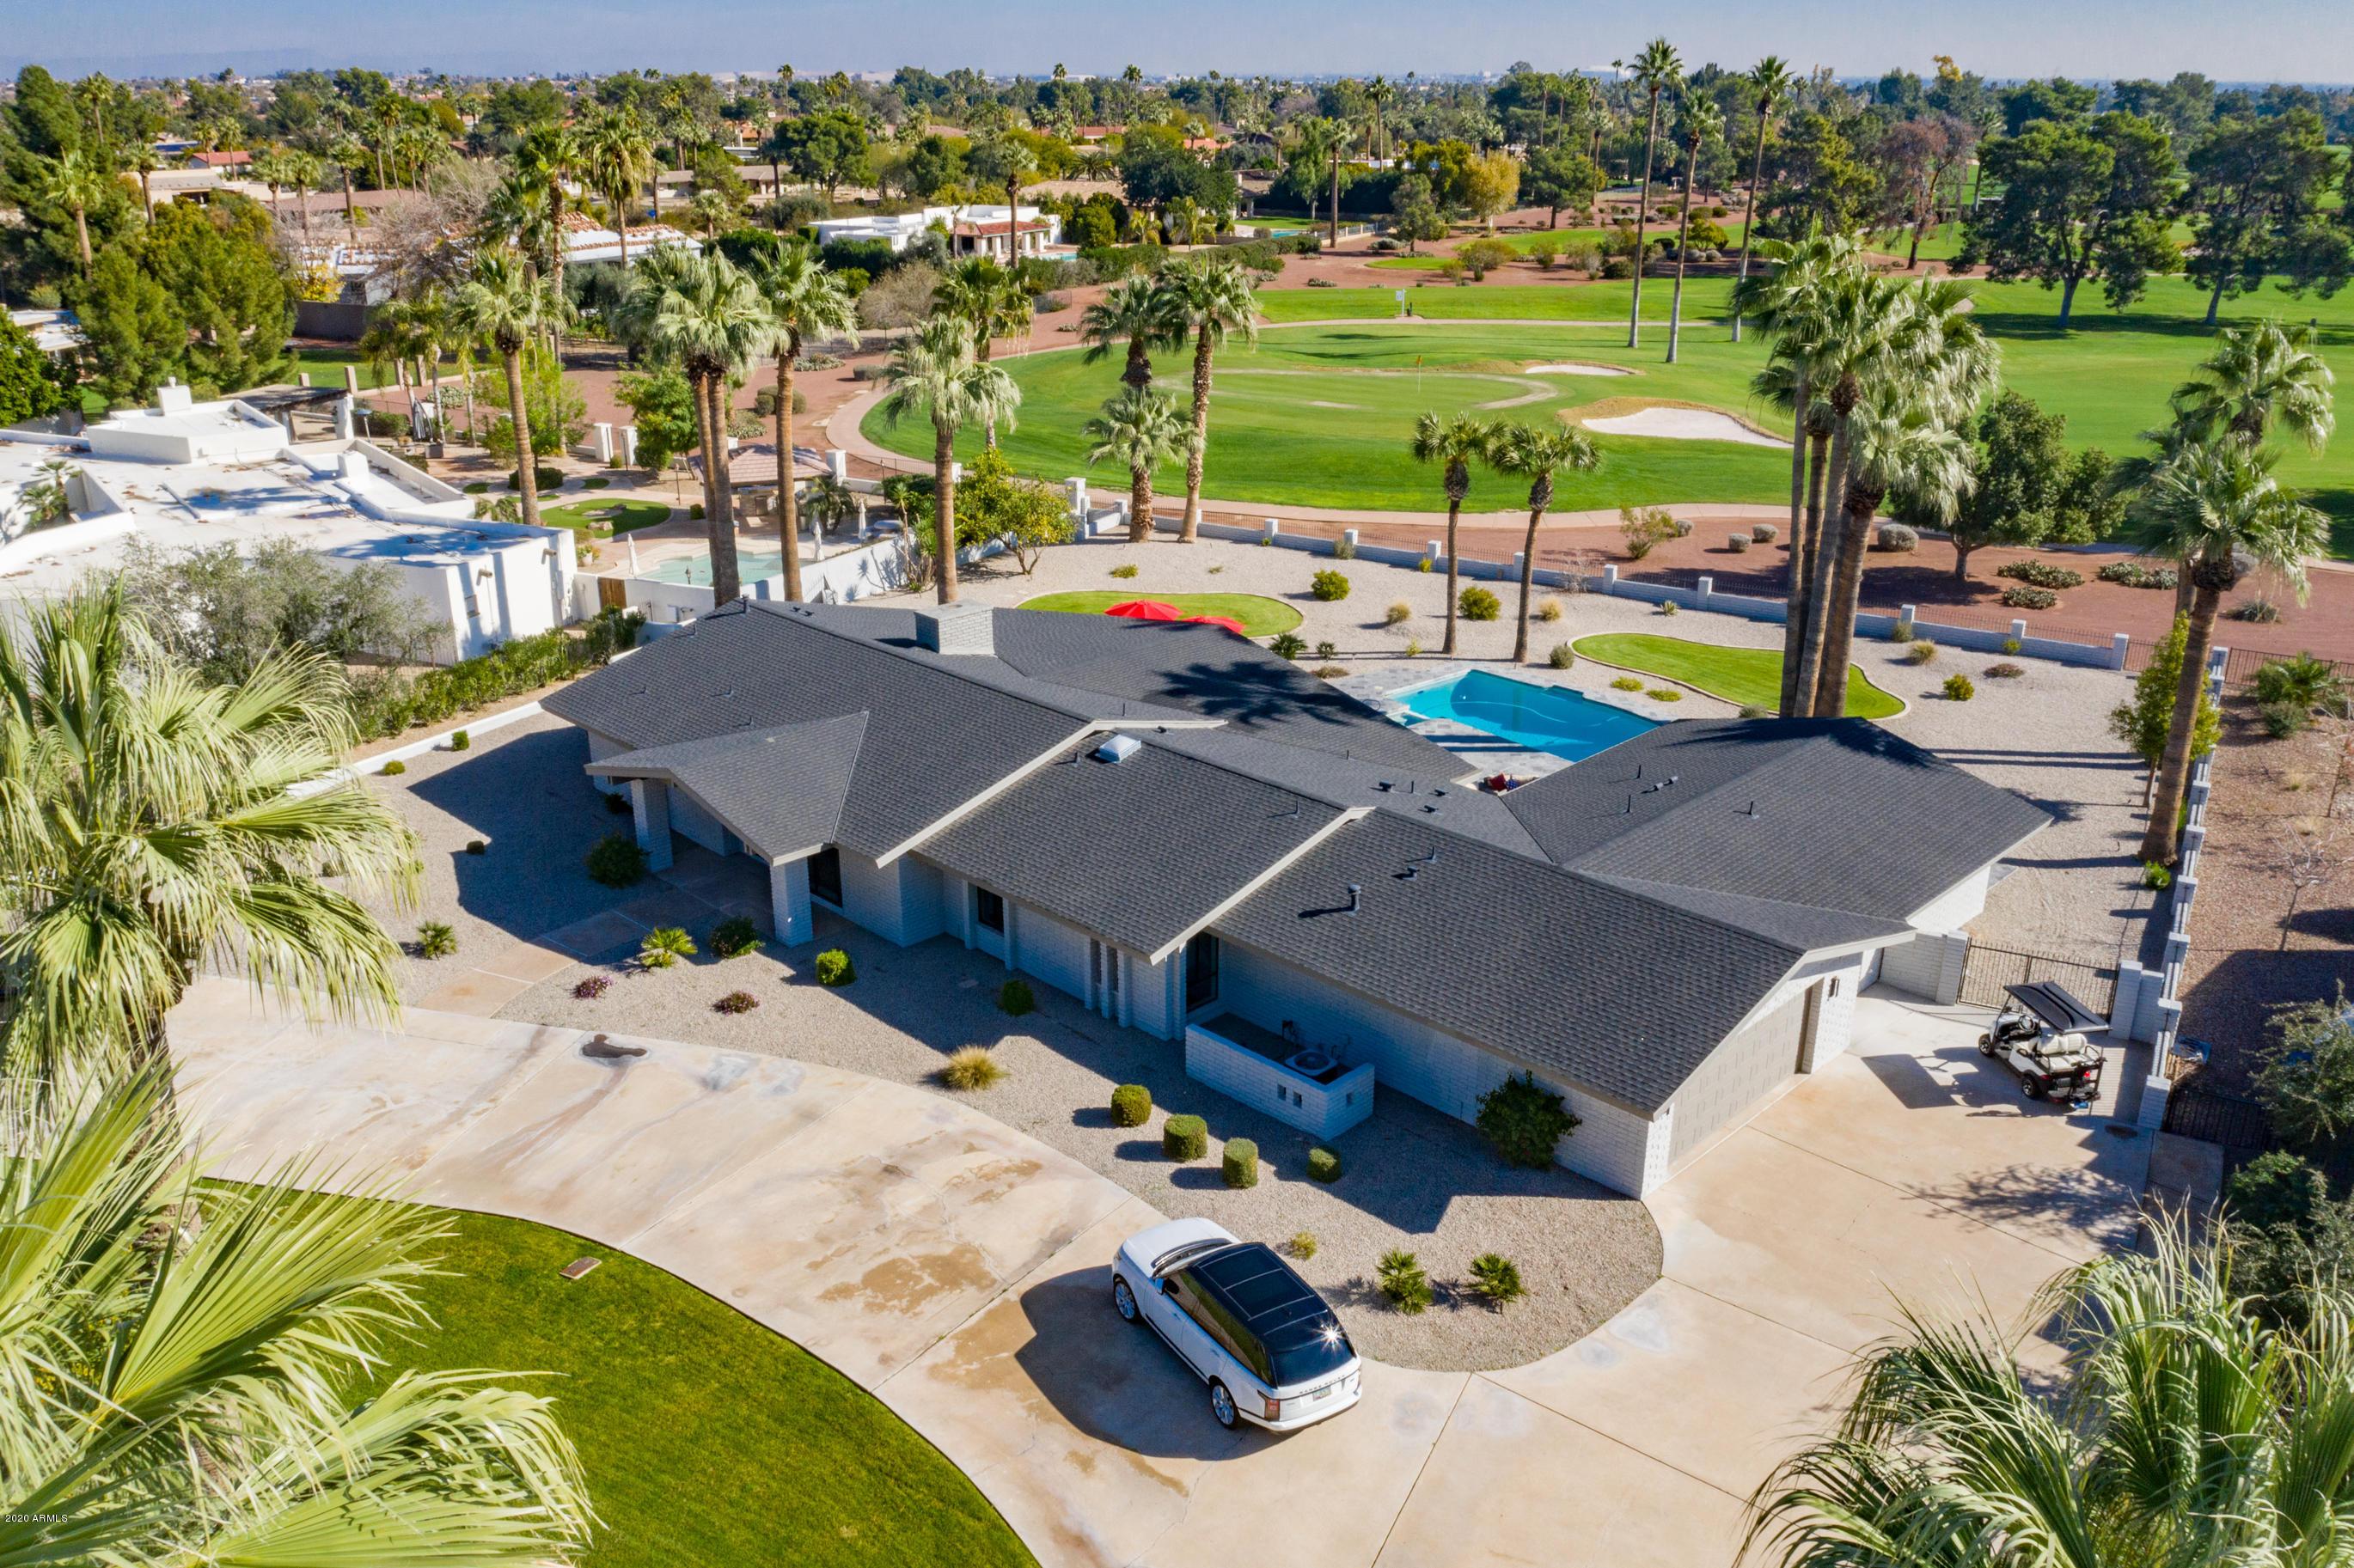 Photo of 611 N Old Litchfield Road, Litchfield Park, AZ 85340